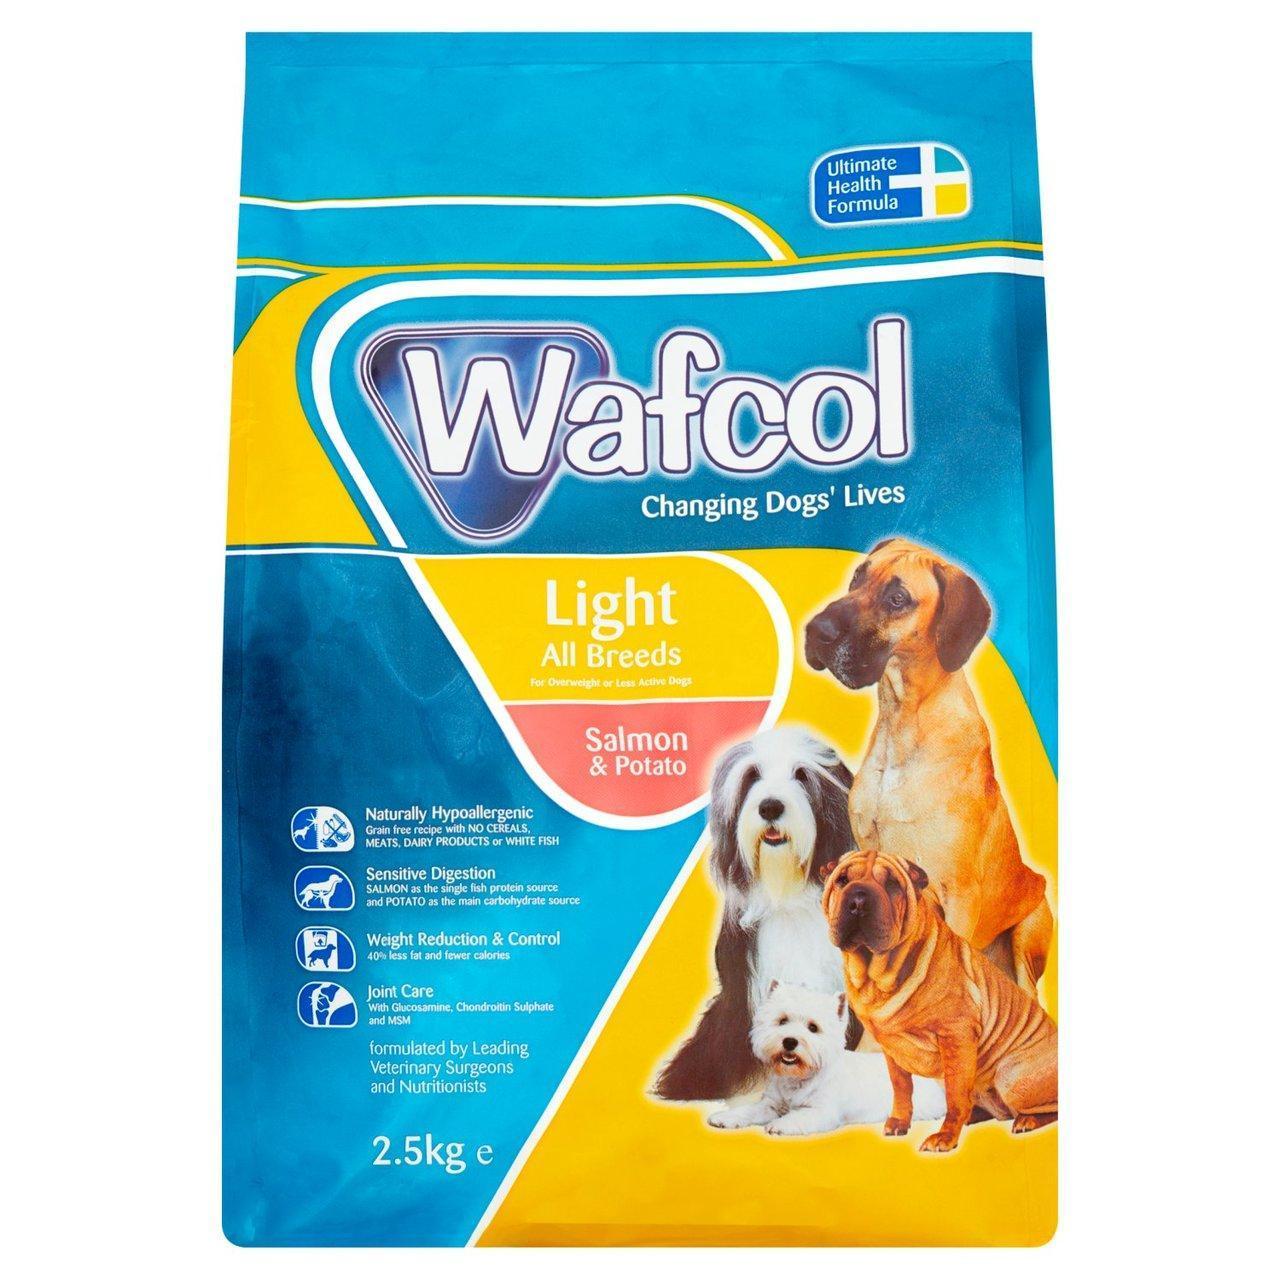 Wafcol Light Salmon Potato Dry Dog Food 12kg